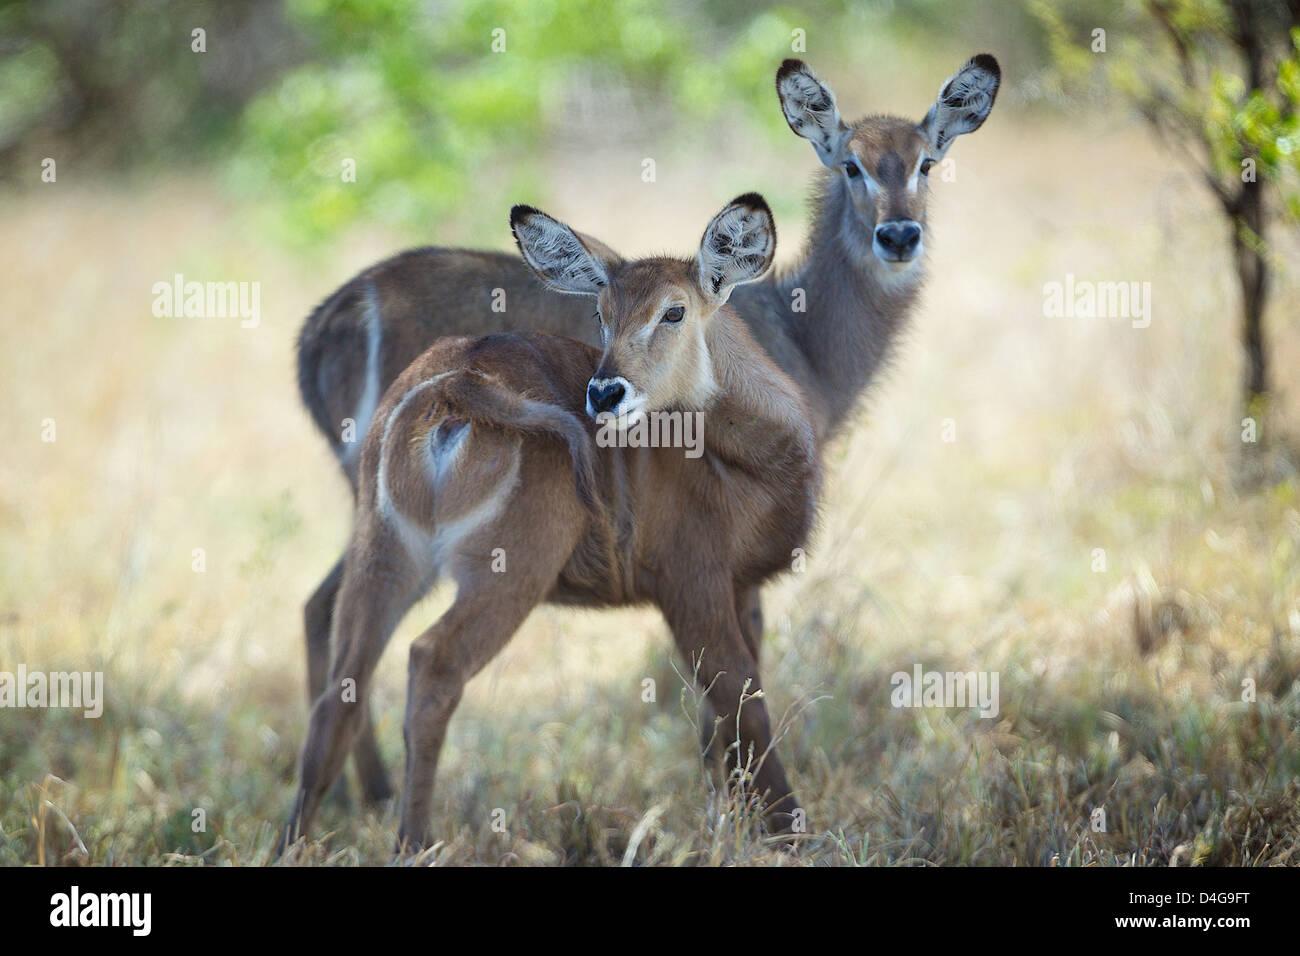 Young waterbuck  Kobus ellipsiprymnus  Saadani National Park Africa - Stock Image